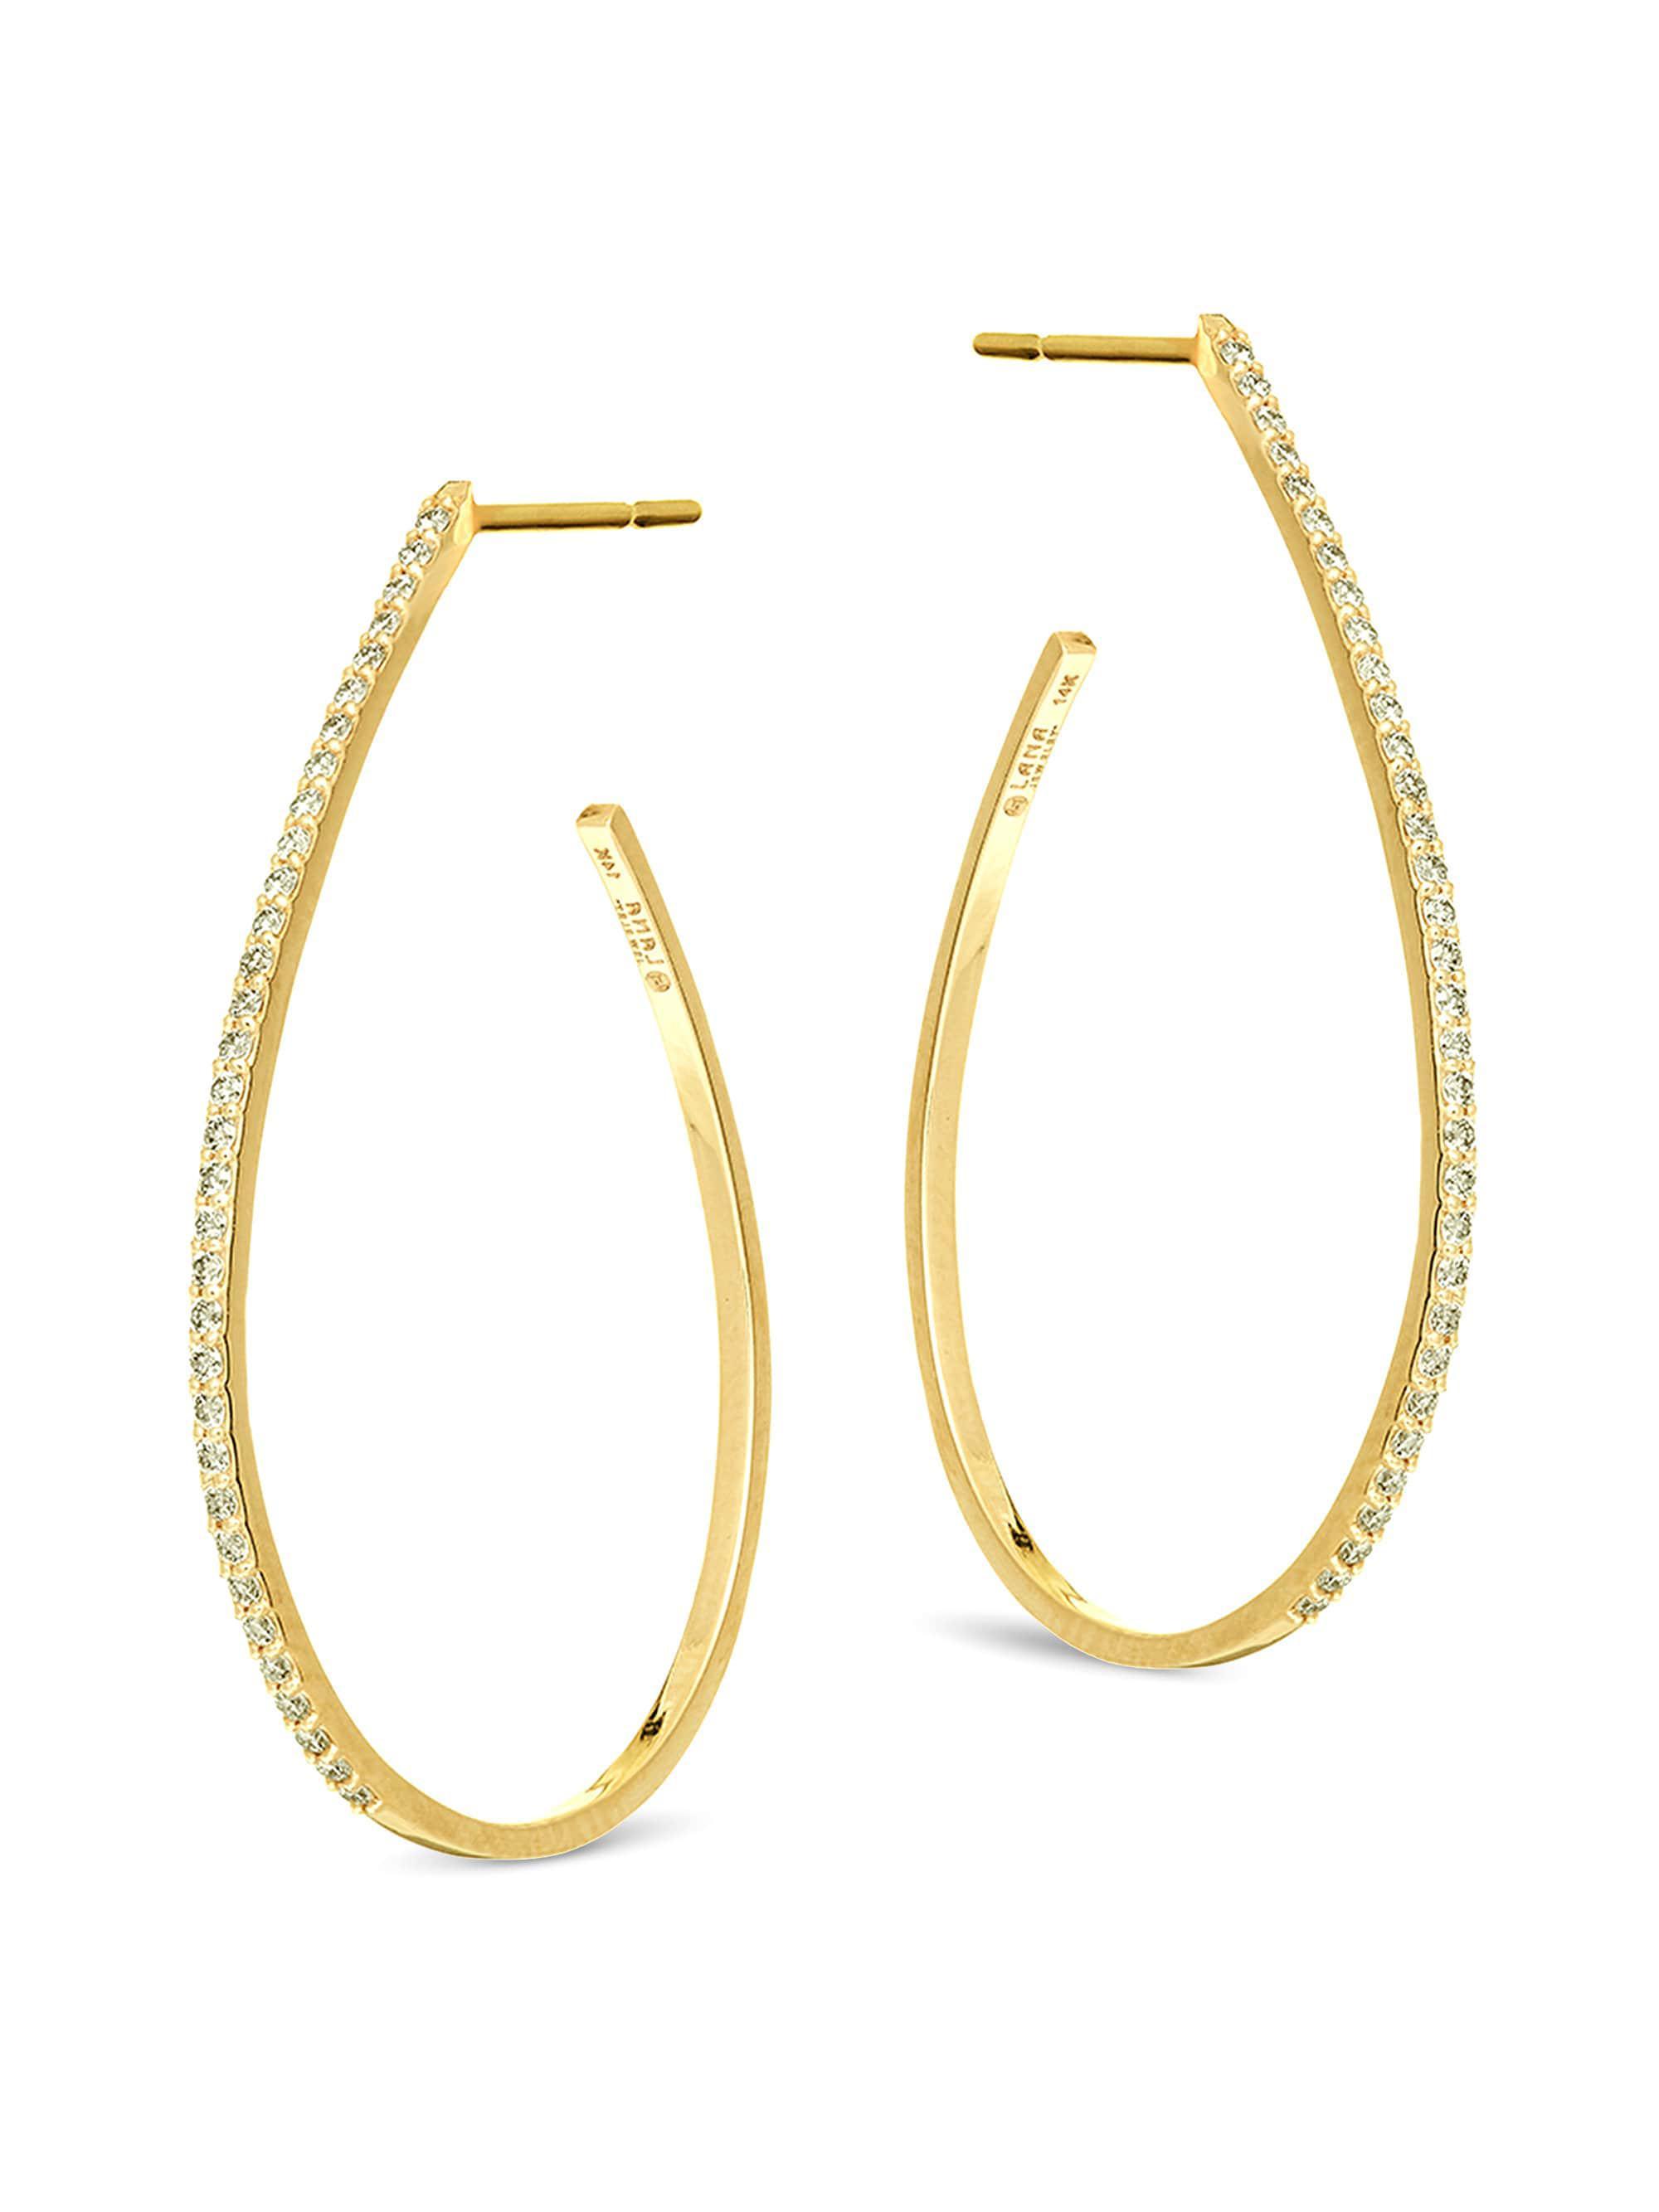 Lana Jewelry Flawless Huggie Hoop Earrings with Diamonds Lq7fGqF